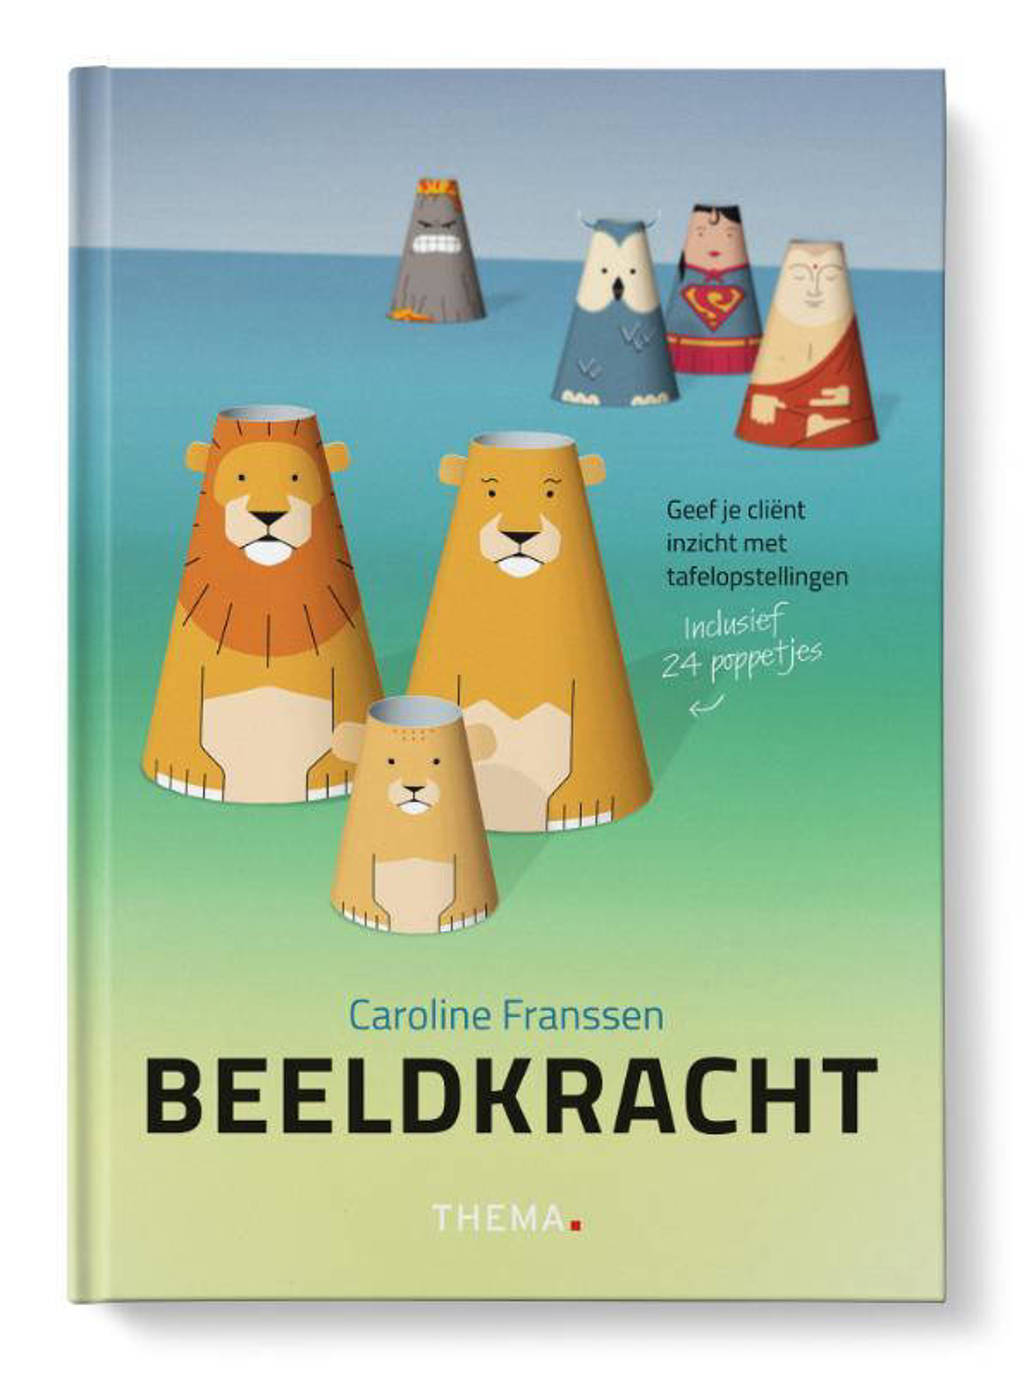 Beeldkracht - Caroline Franssen